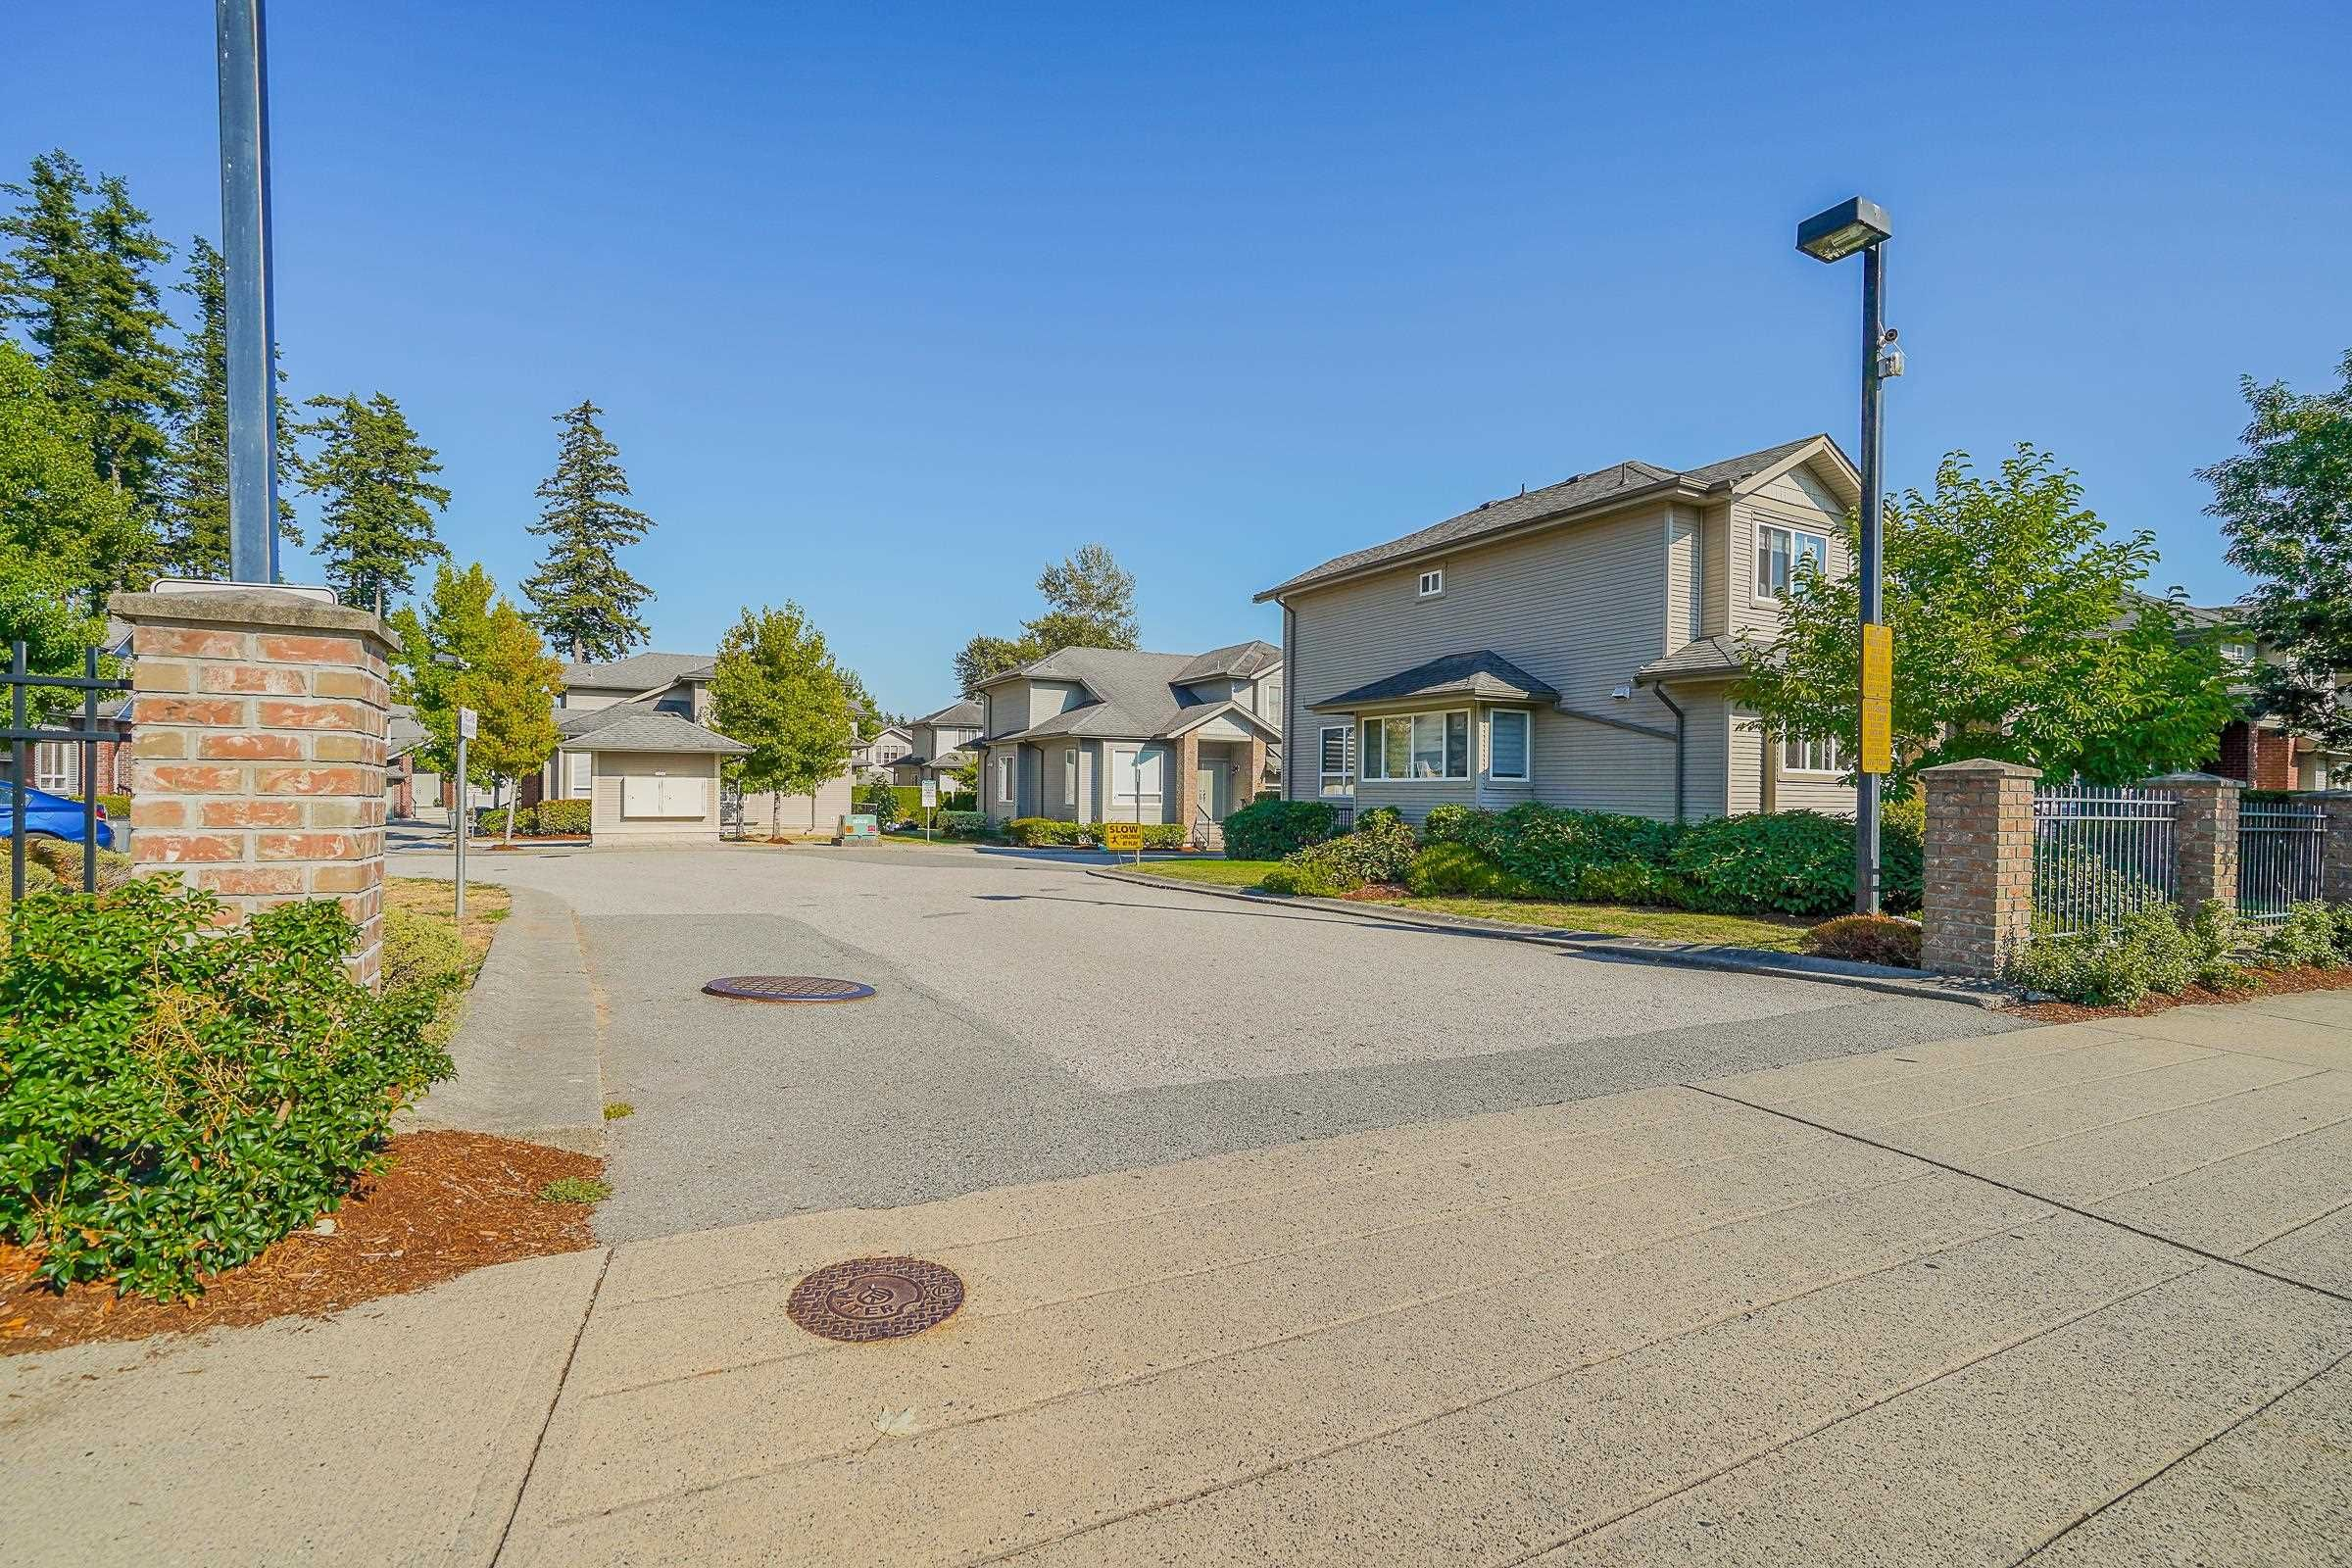 Main Photo: 1 6116 128 Street in Surrey: Panorama Ridge Townhouse for sale : MLS®# R2612053